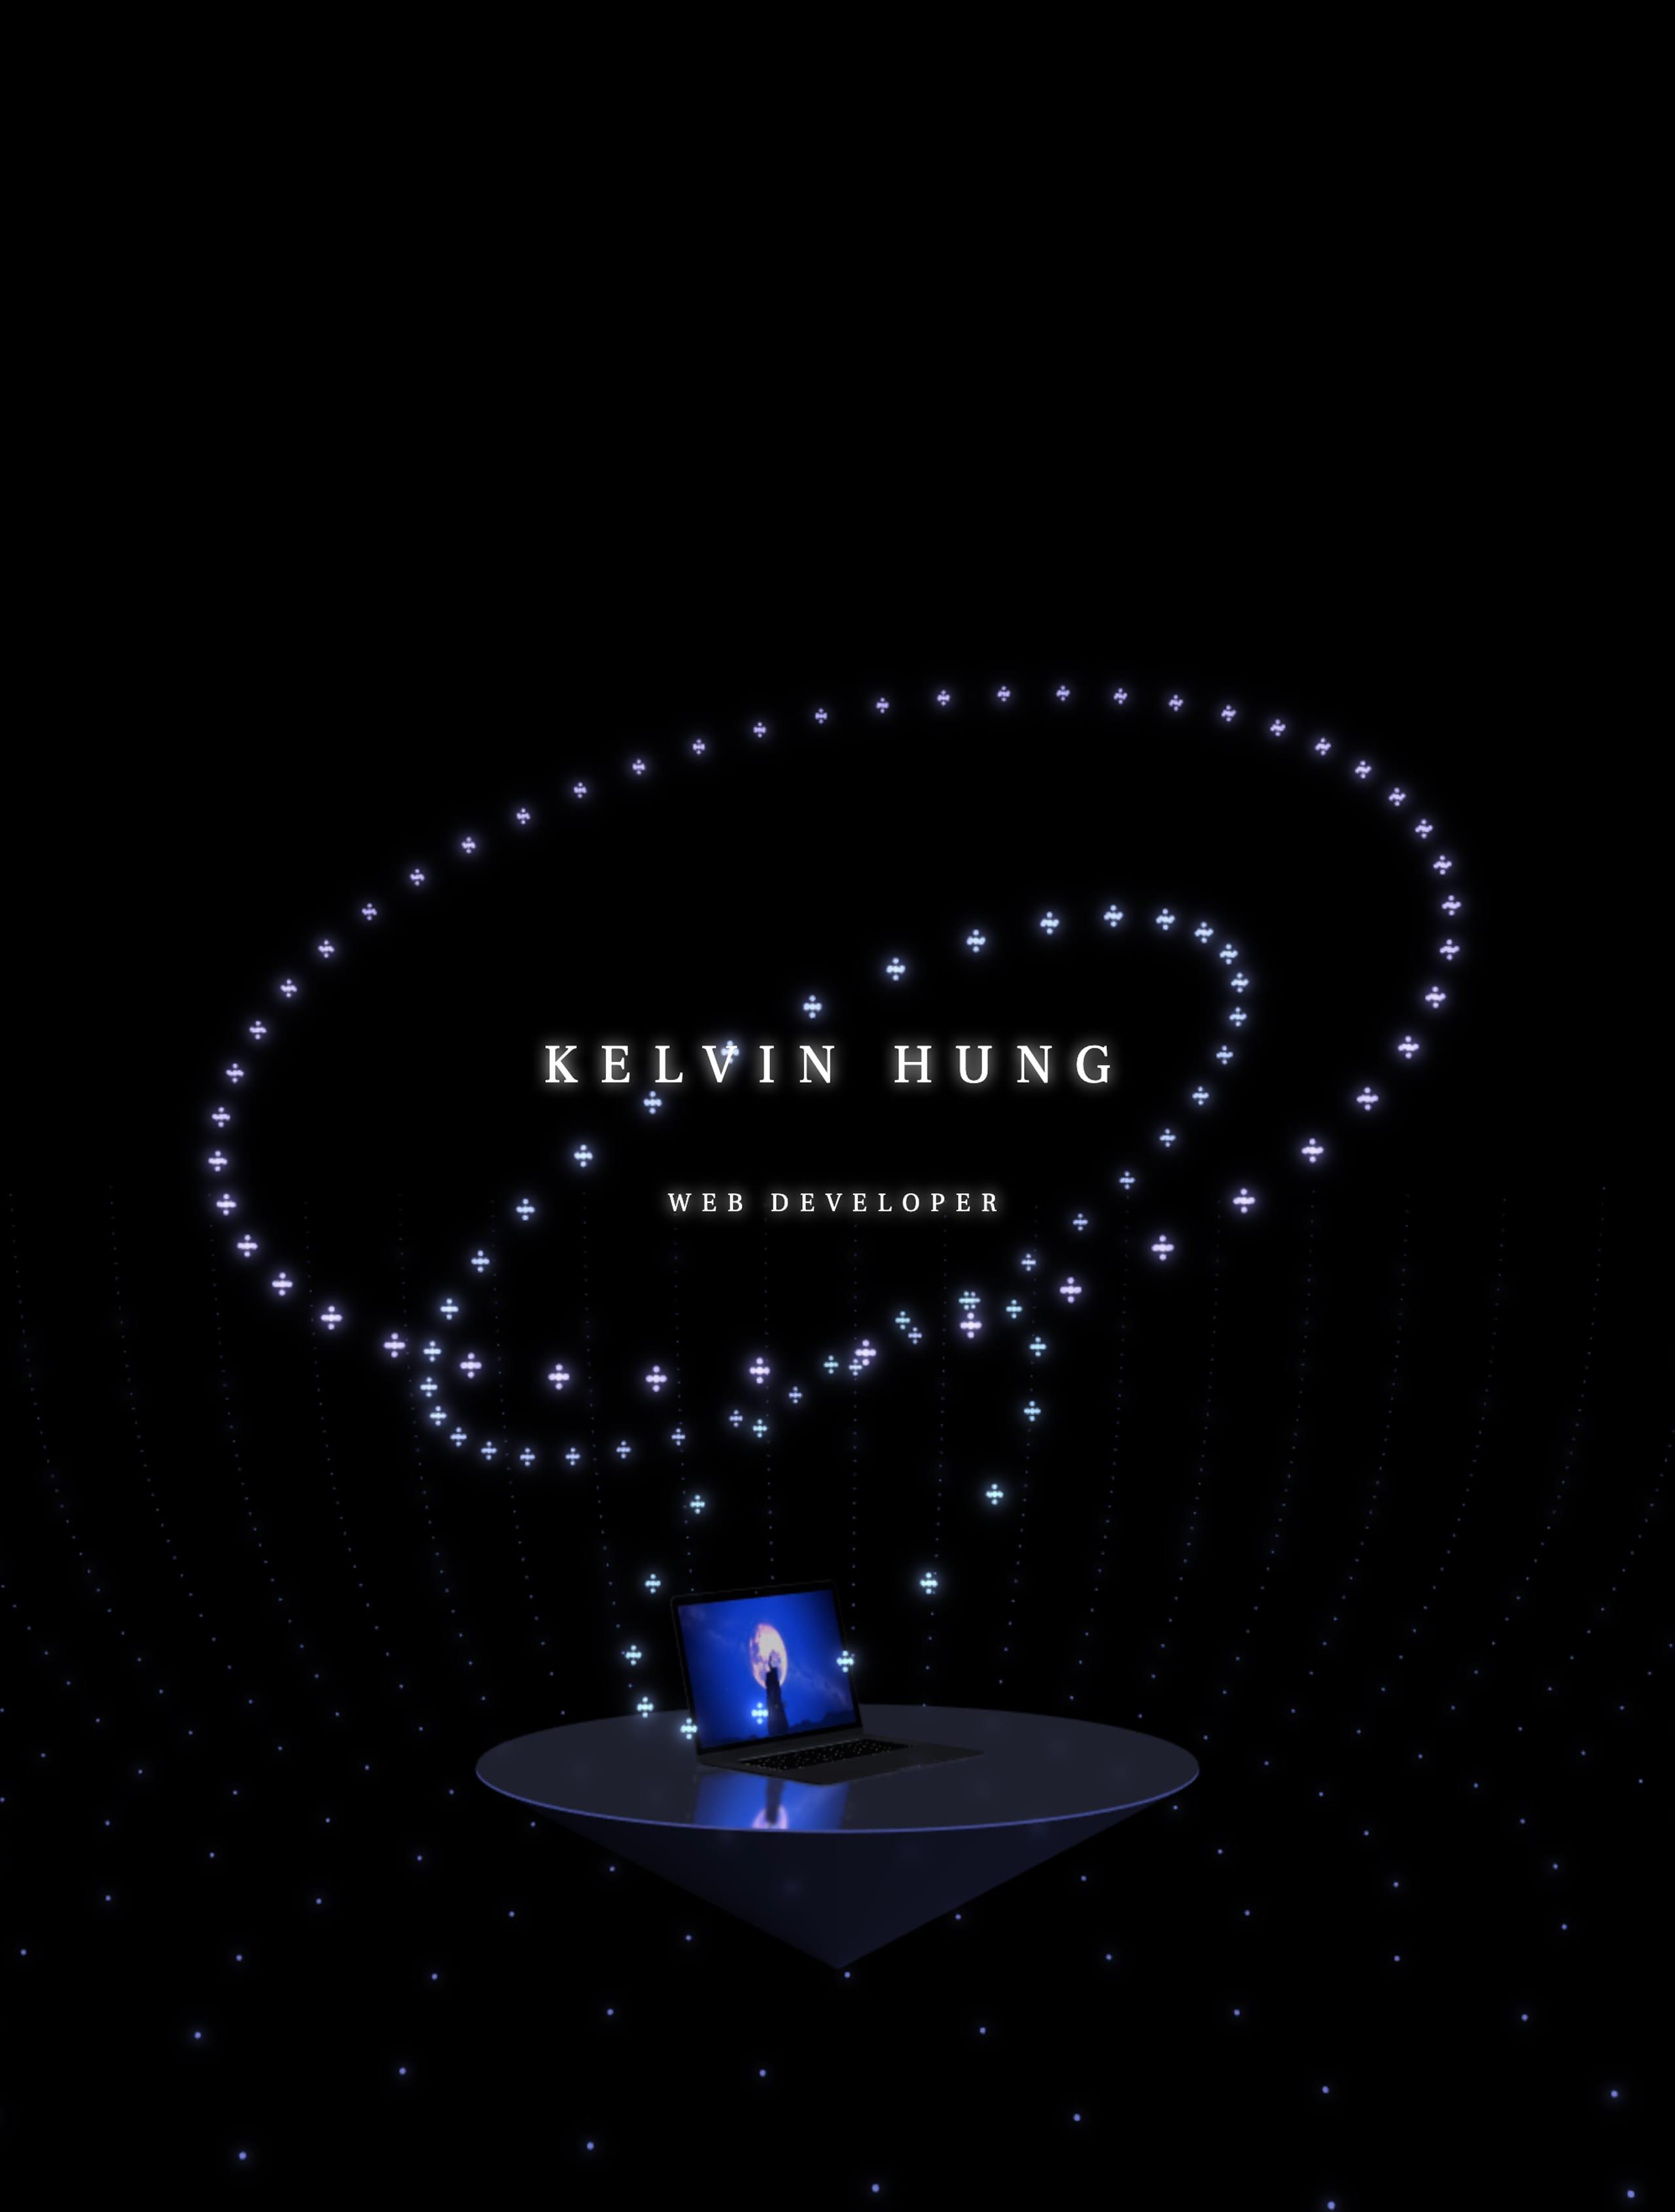 Kelvin Hung Website Screenshot